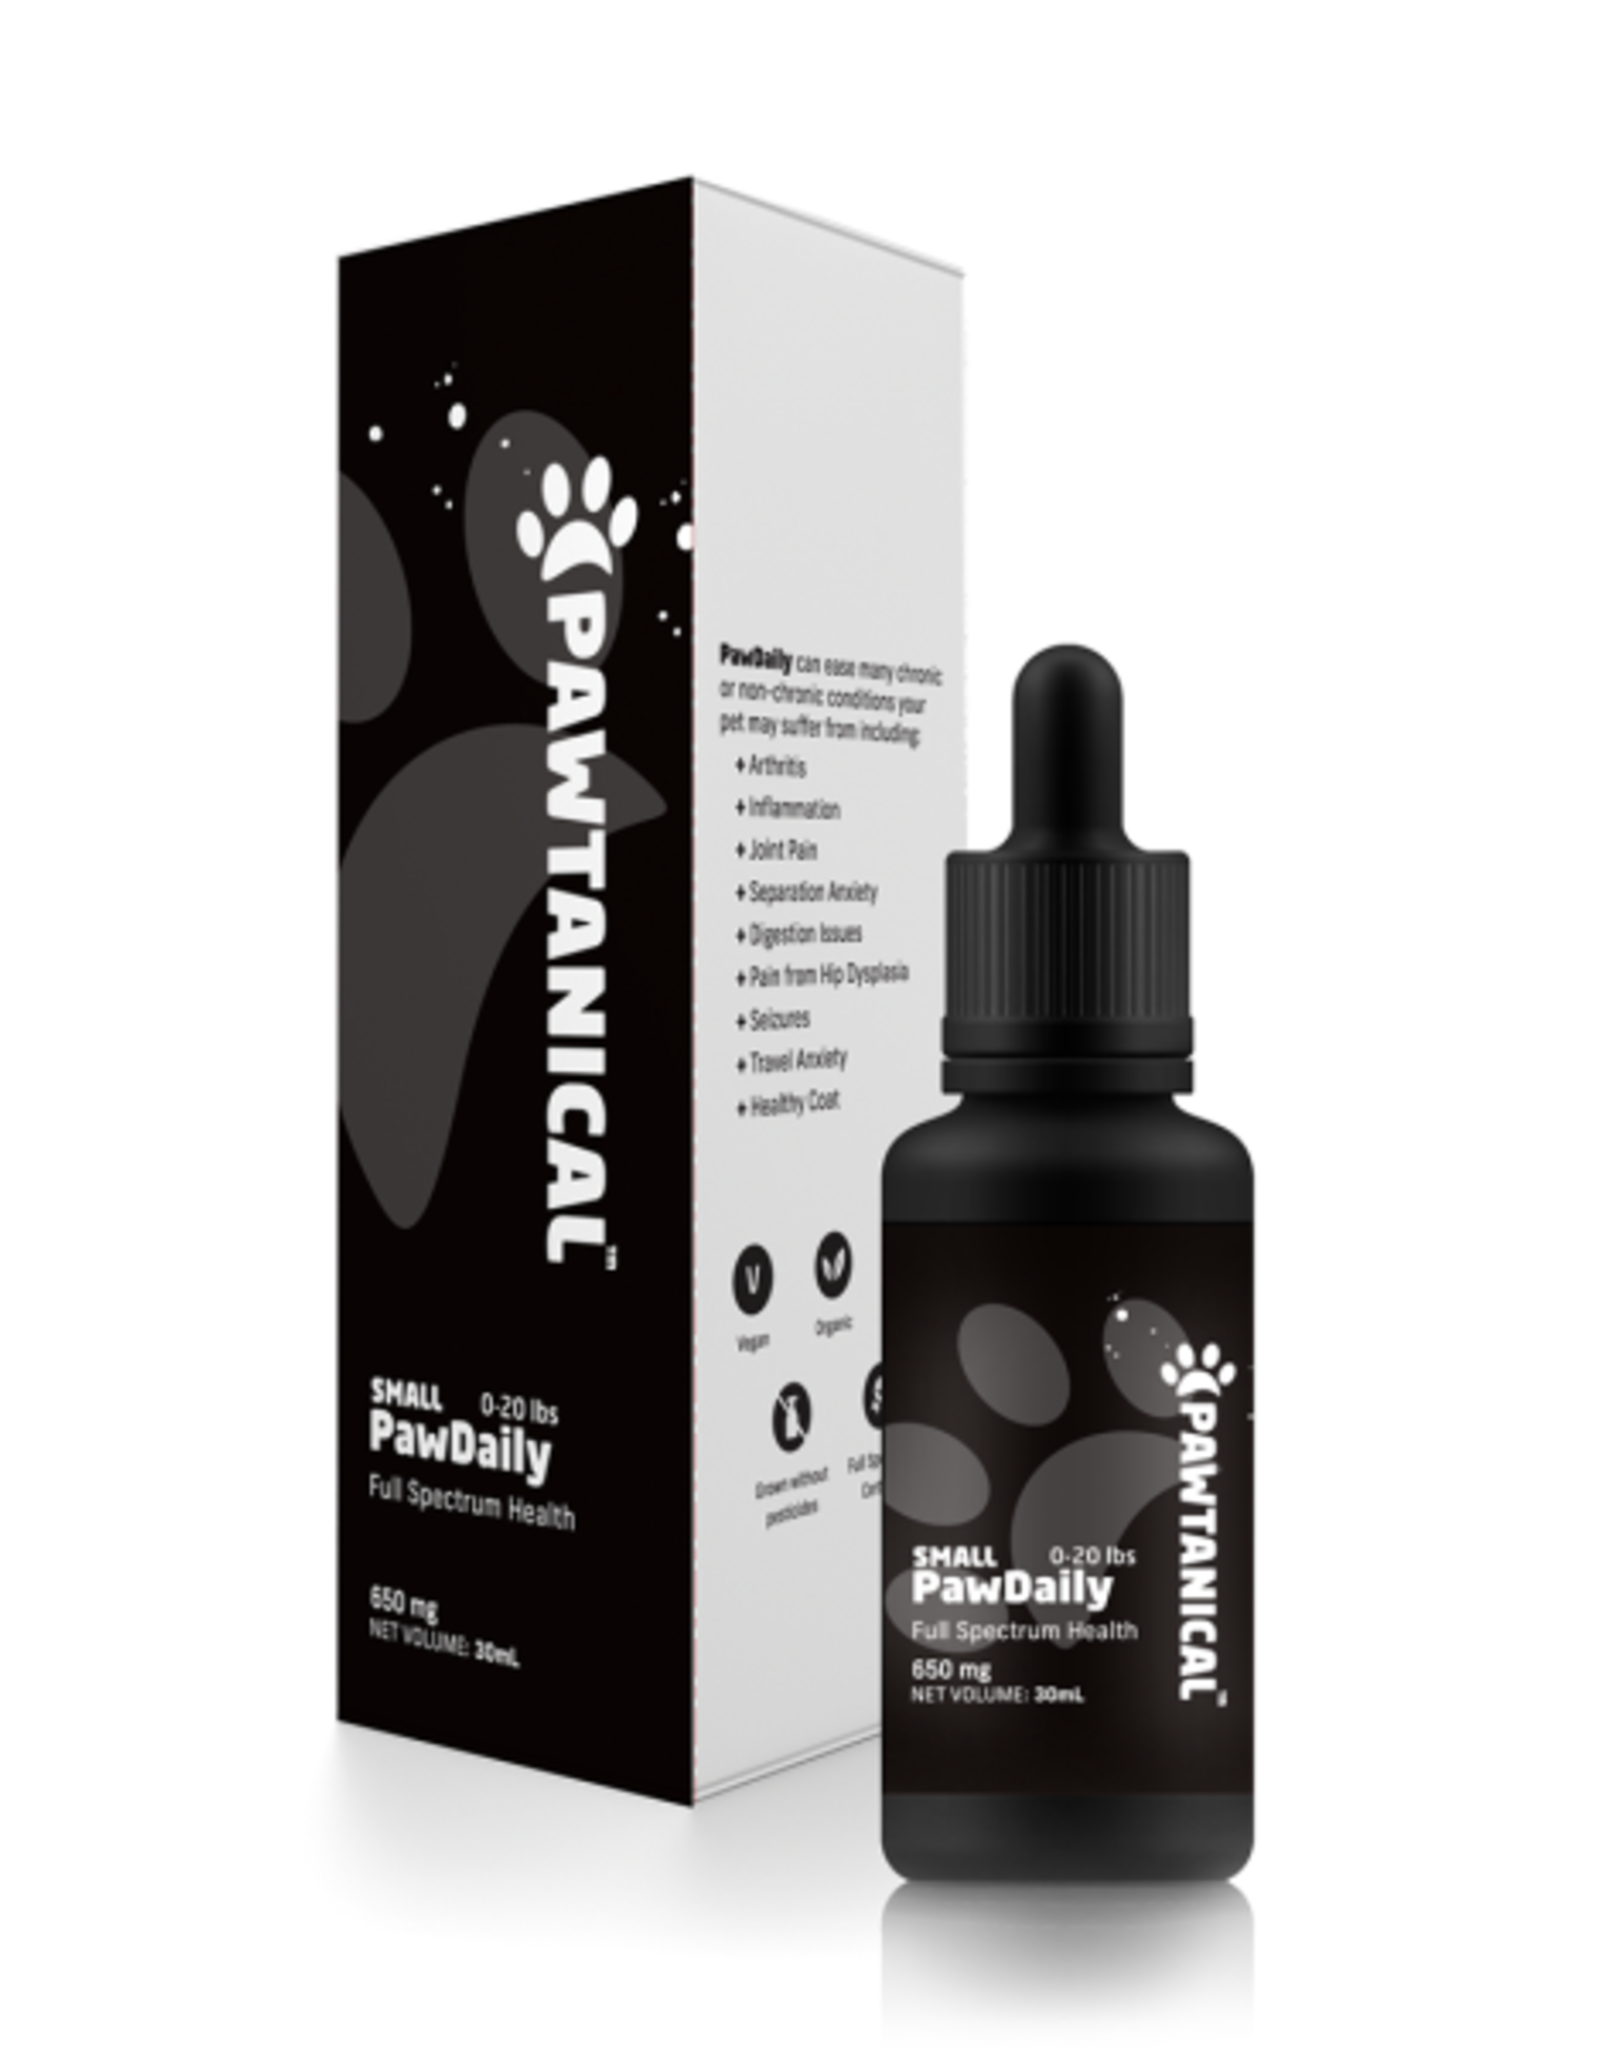 Pawtanical Full Spectrum Hemp Oil Tincture 300 mg